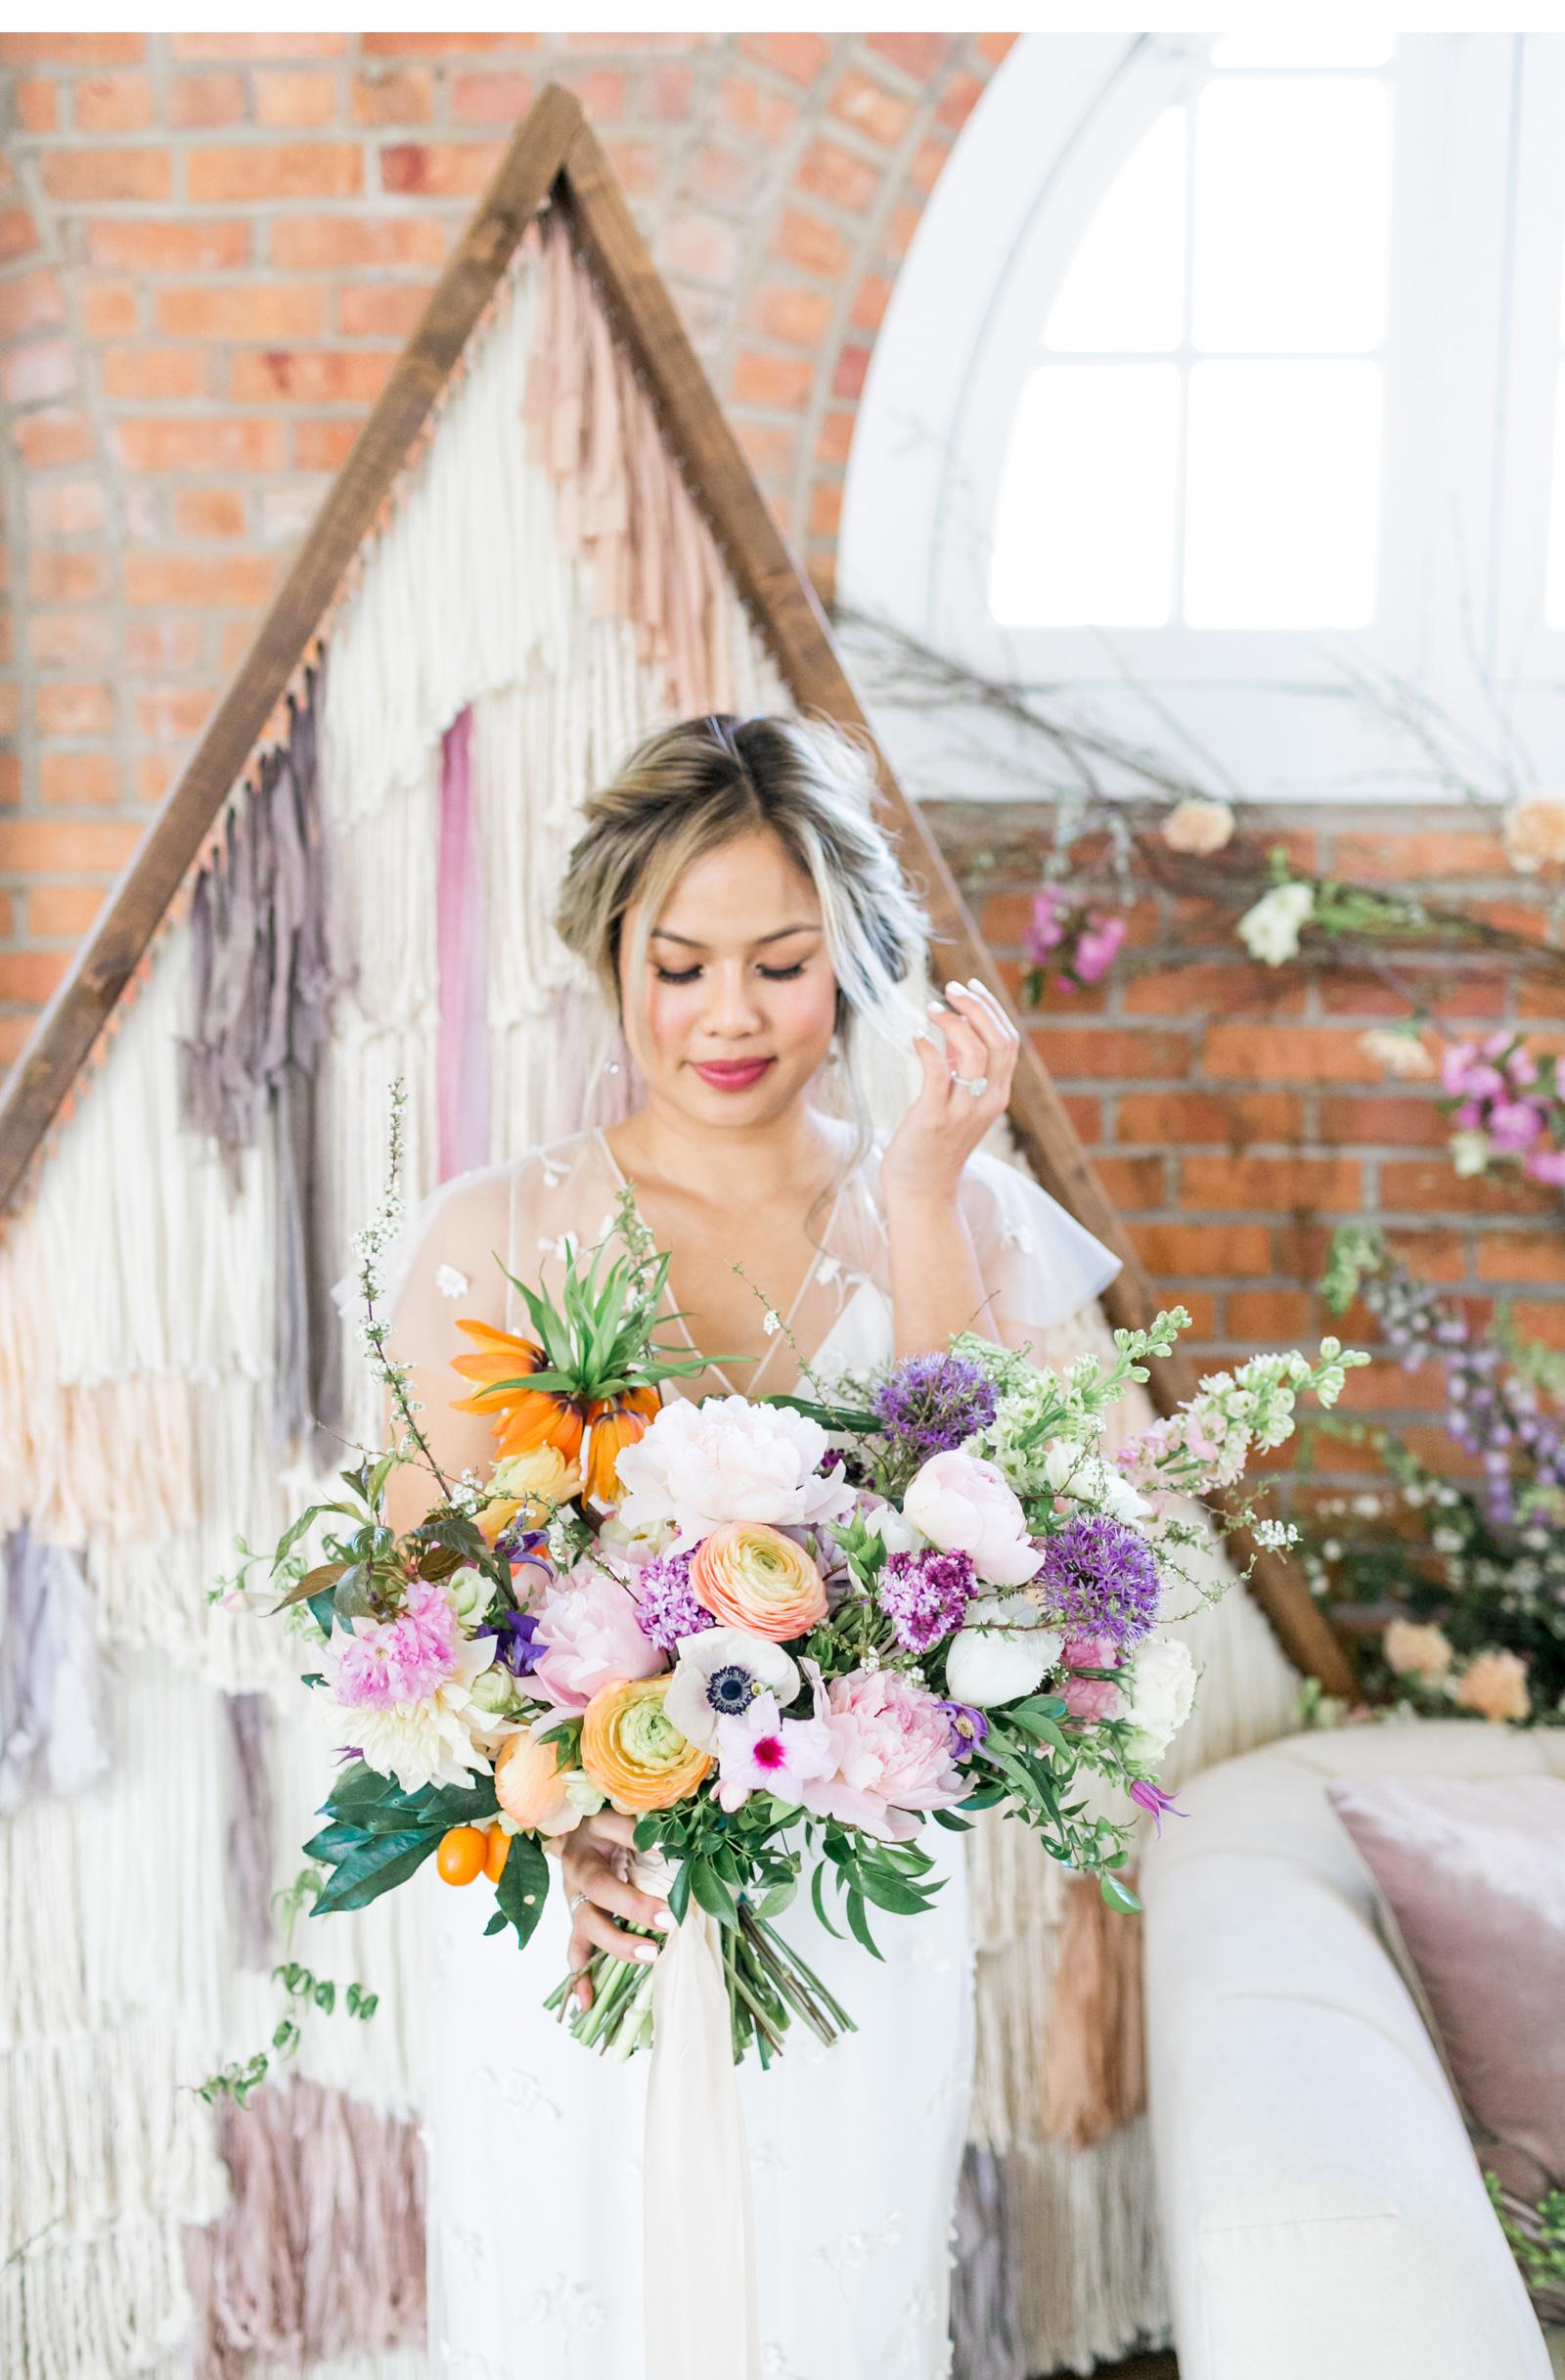 Malibu-Weddings-Natalie-Schutt-Photography-Style-me-Pretty_11.jpg